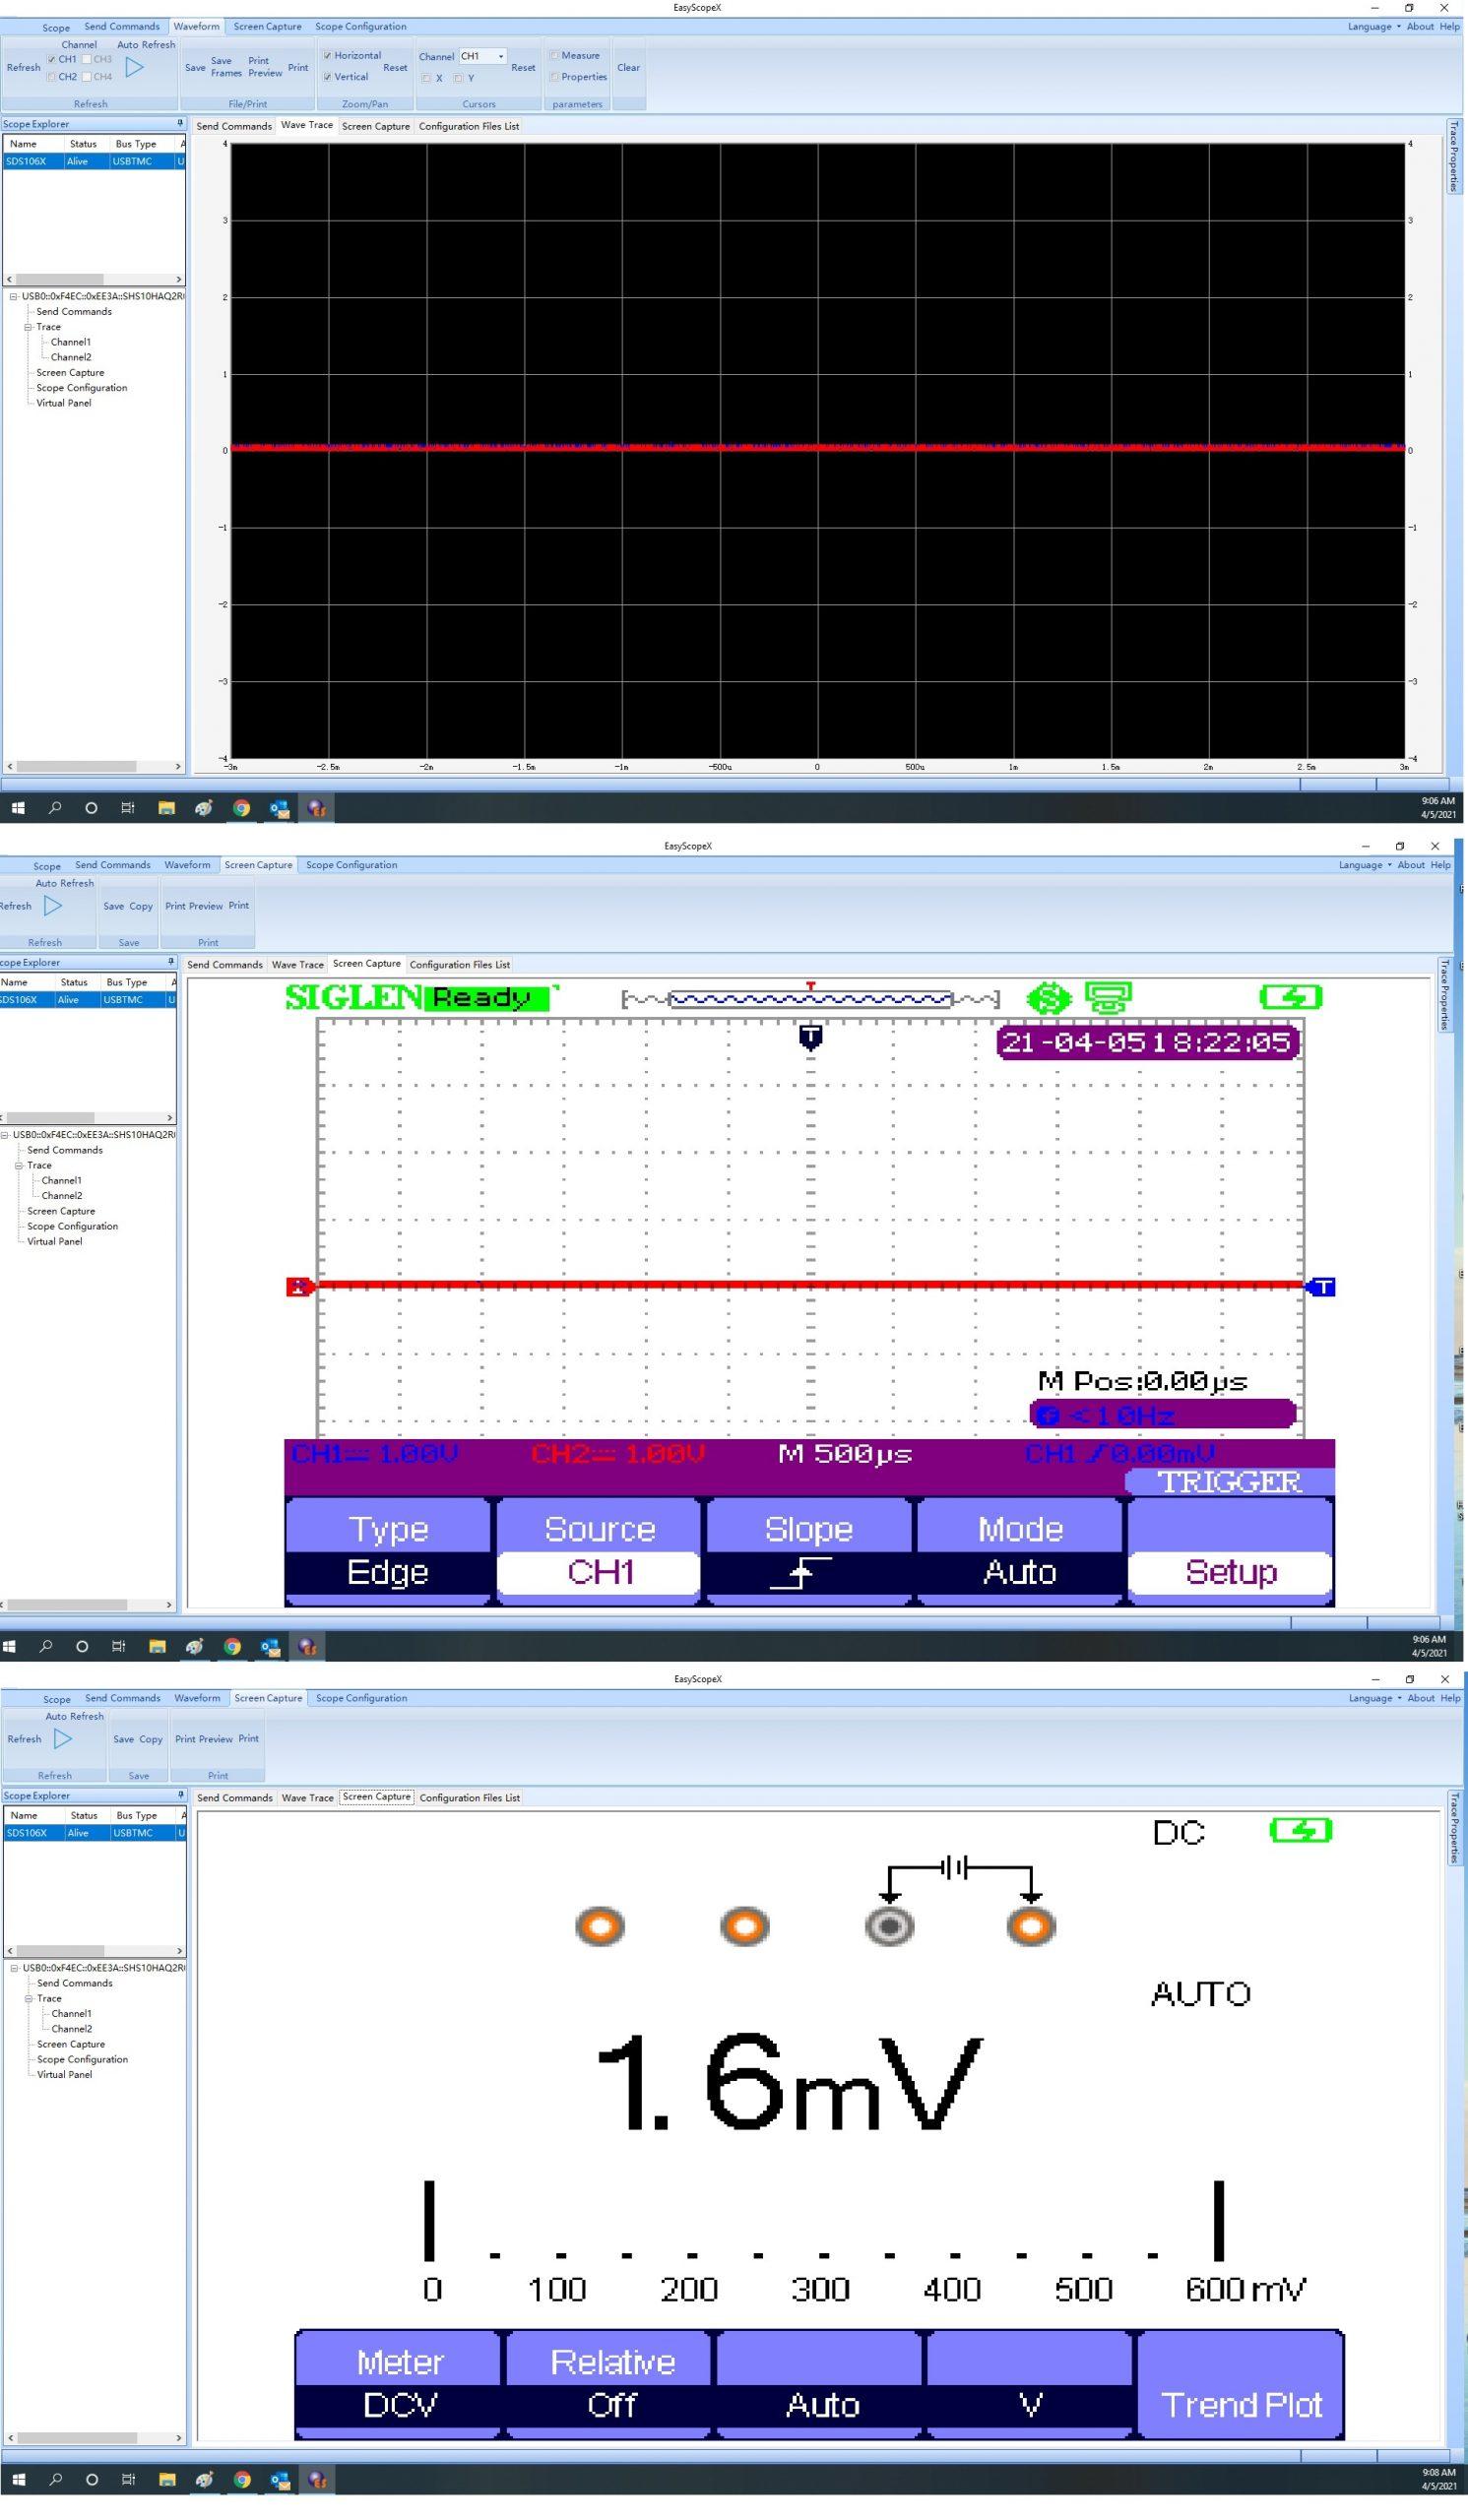 SHS EasyscopeX functions